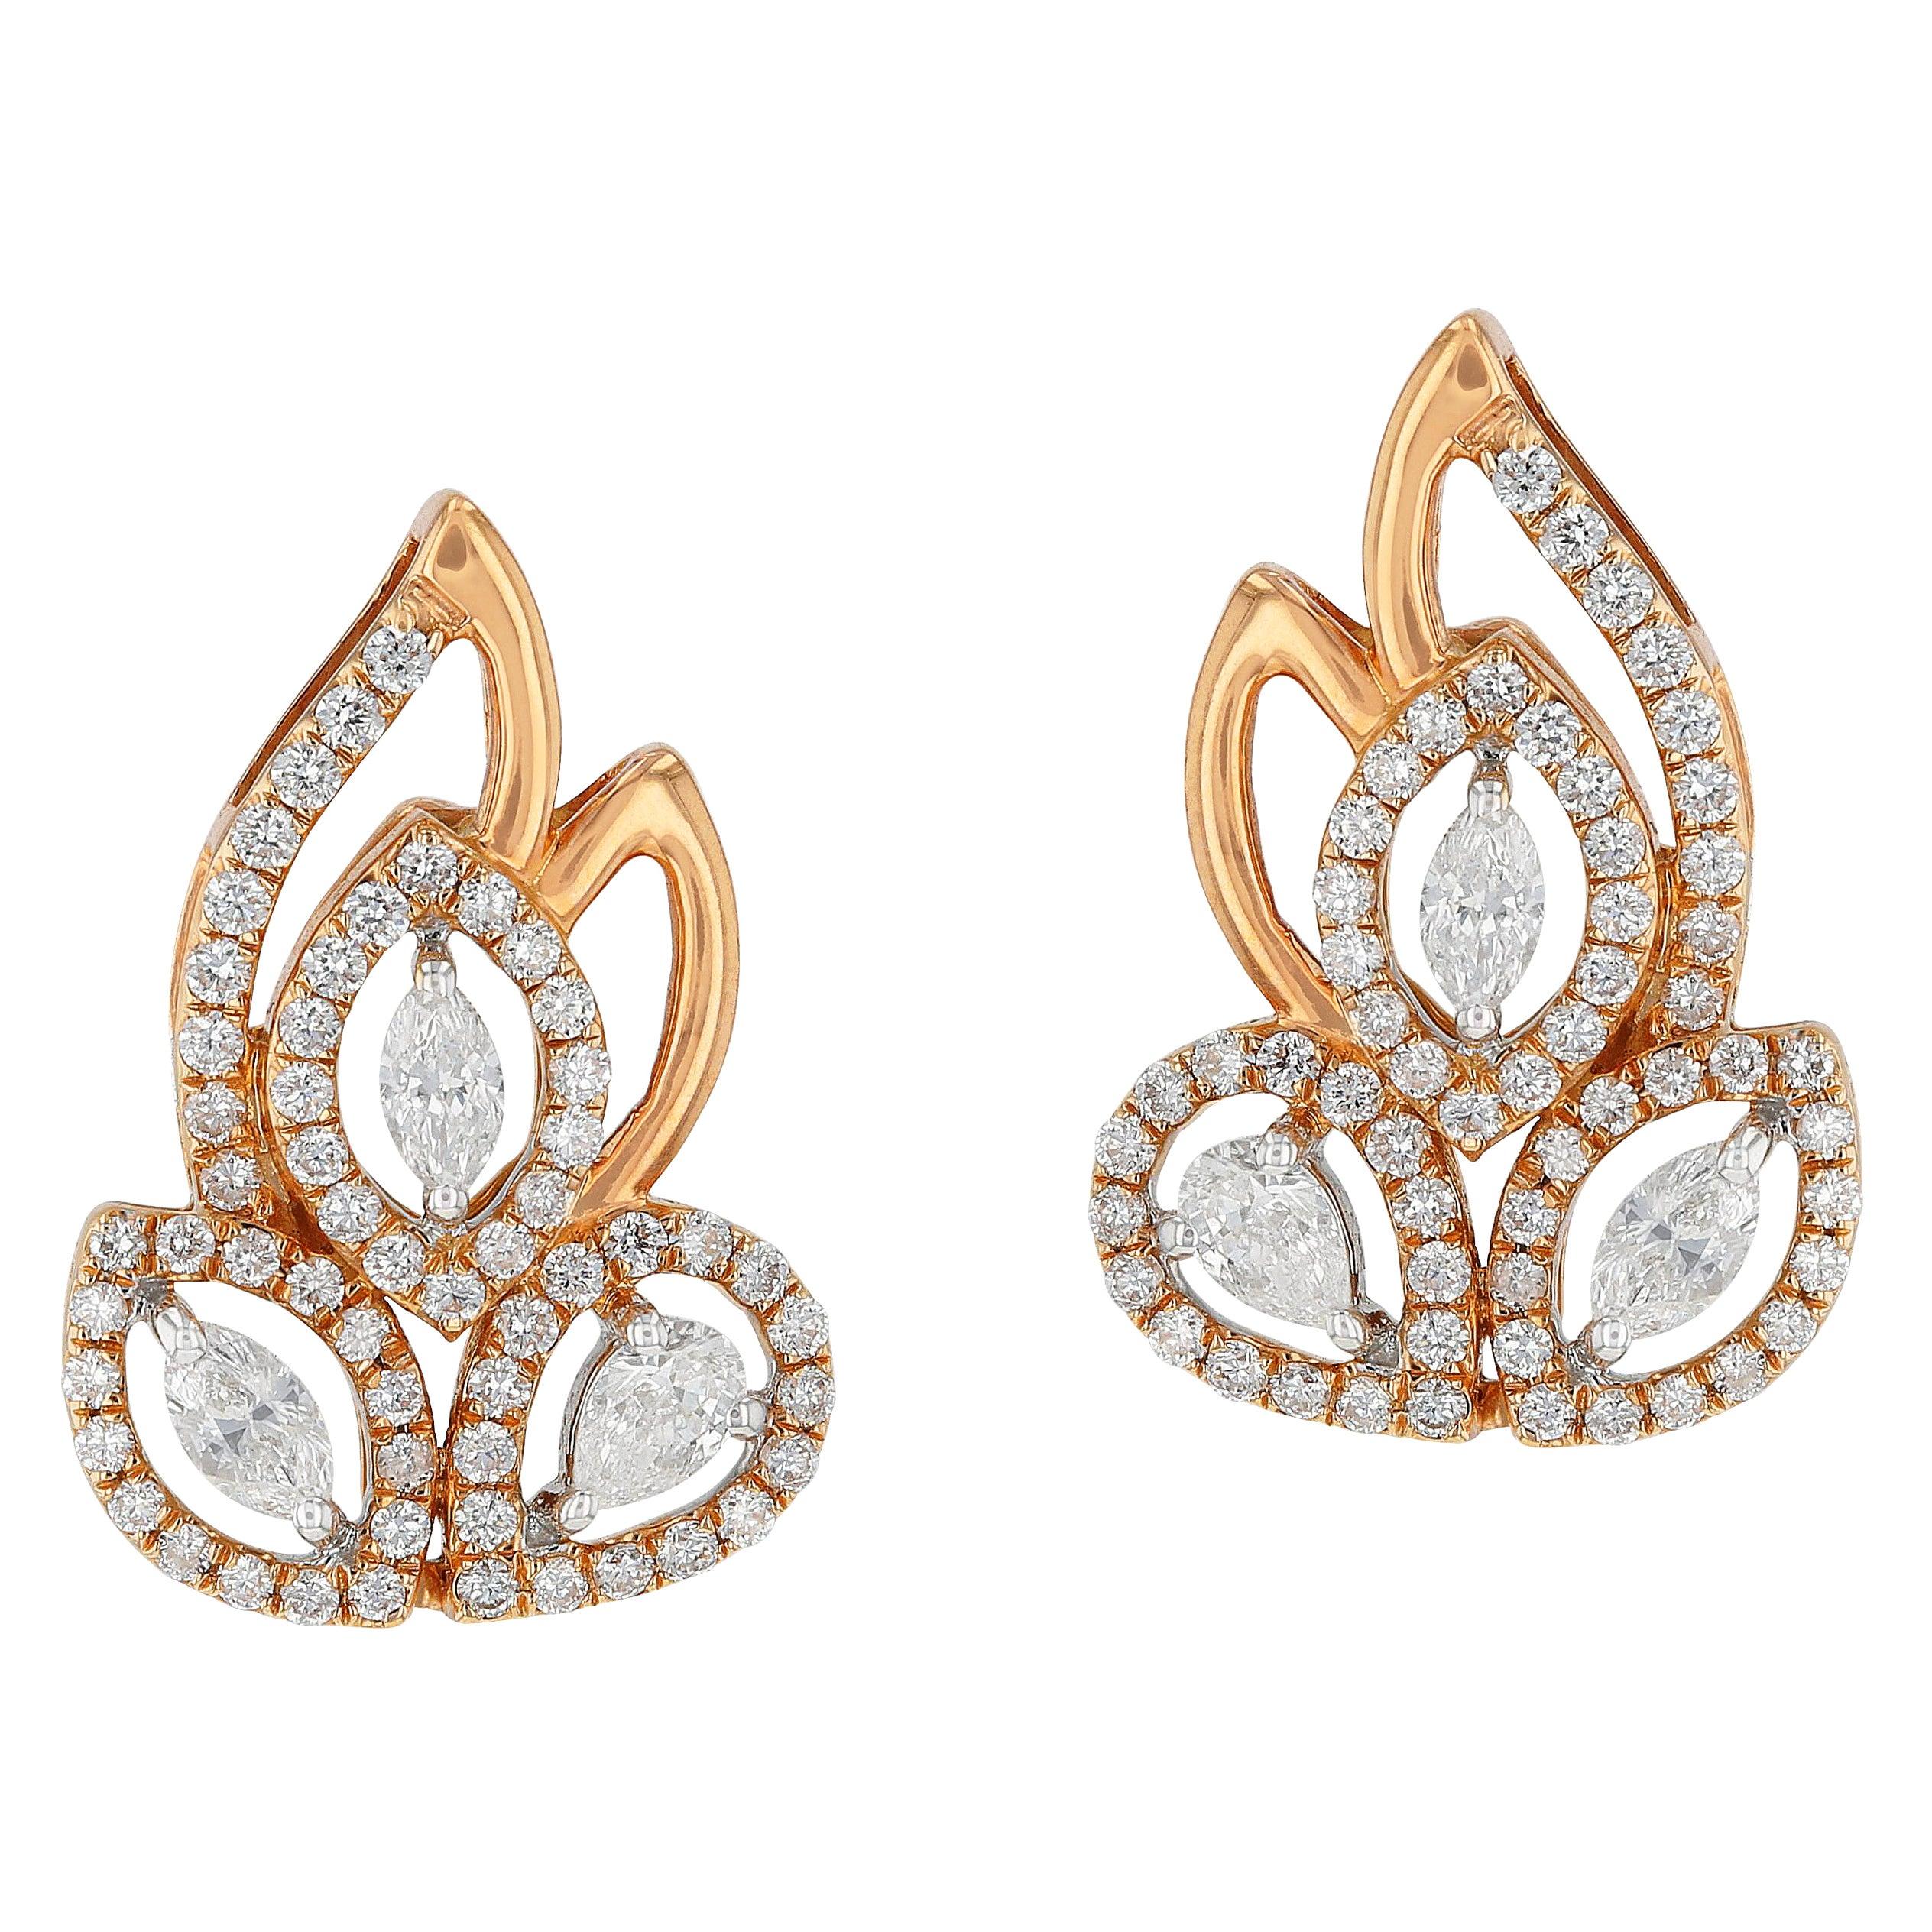 Amwaj Jewelry Pear and Marquise Cut Rose Gold Earrings